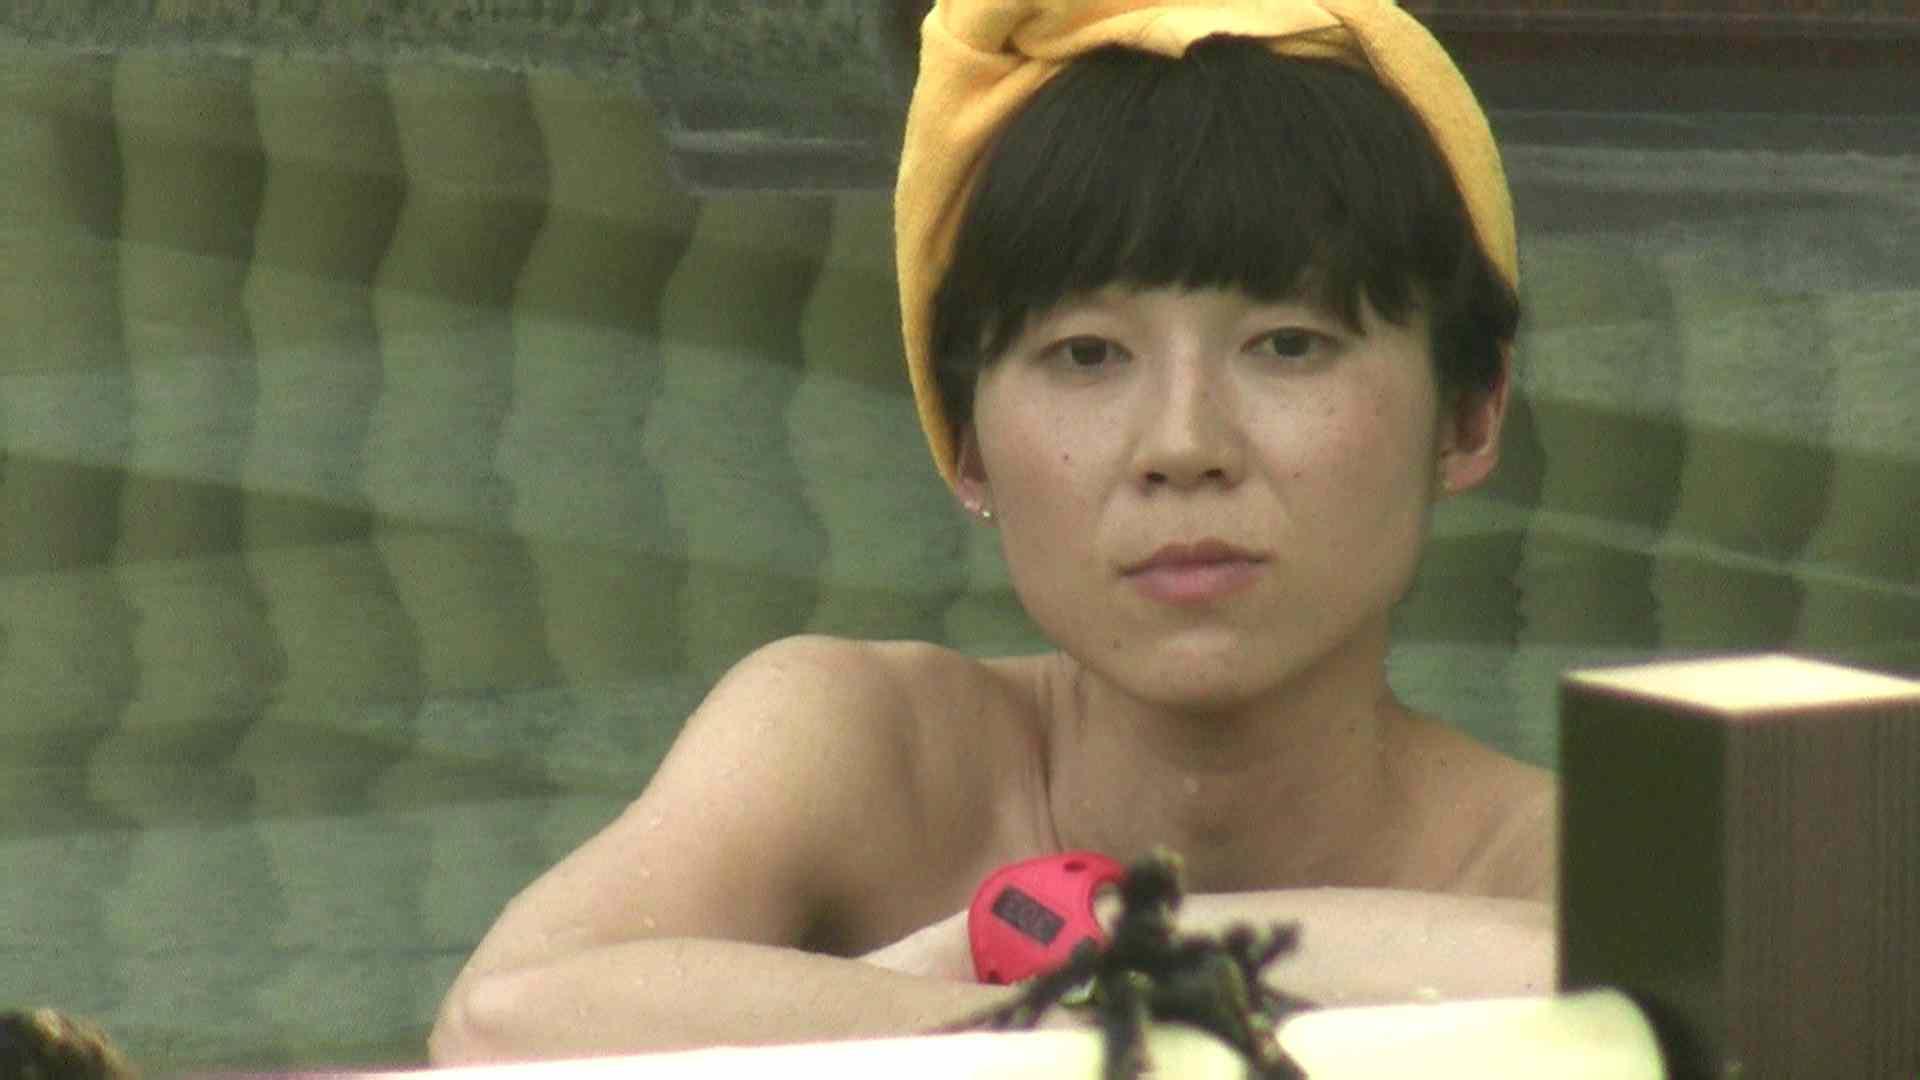 Aquaな露天風呂Vol.633 露天風呂 | OLのエロ生活  50連発 43